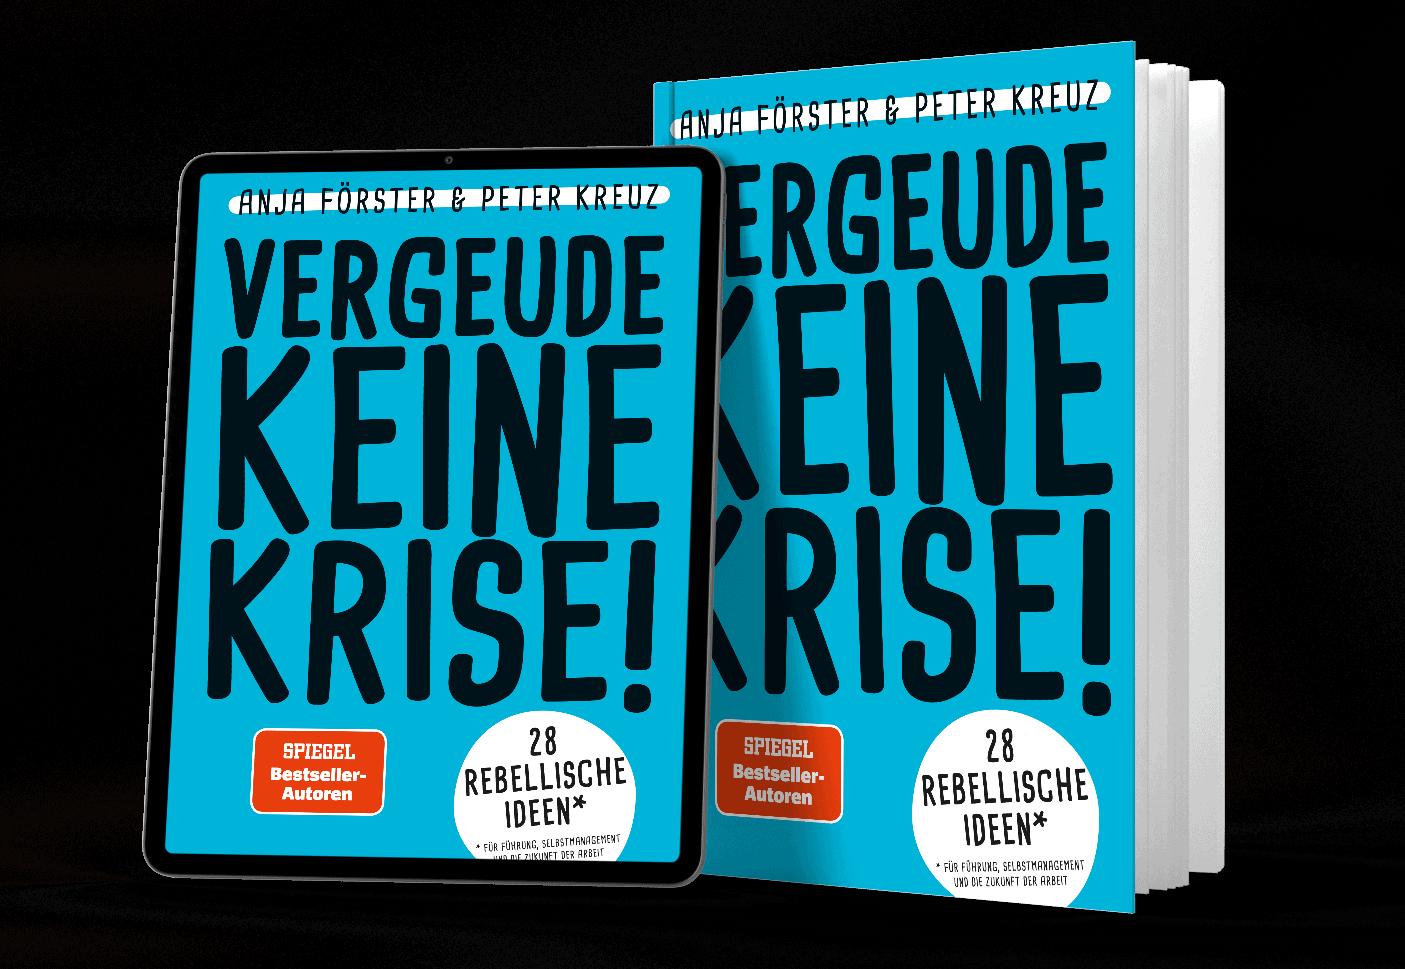 Buchcover Vergeude keine Krise - Bestseller